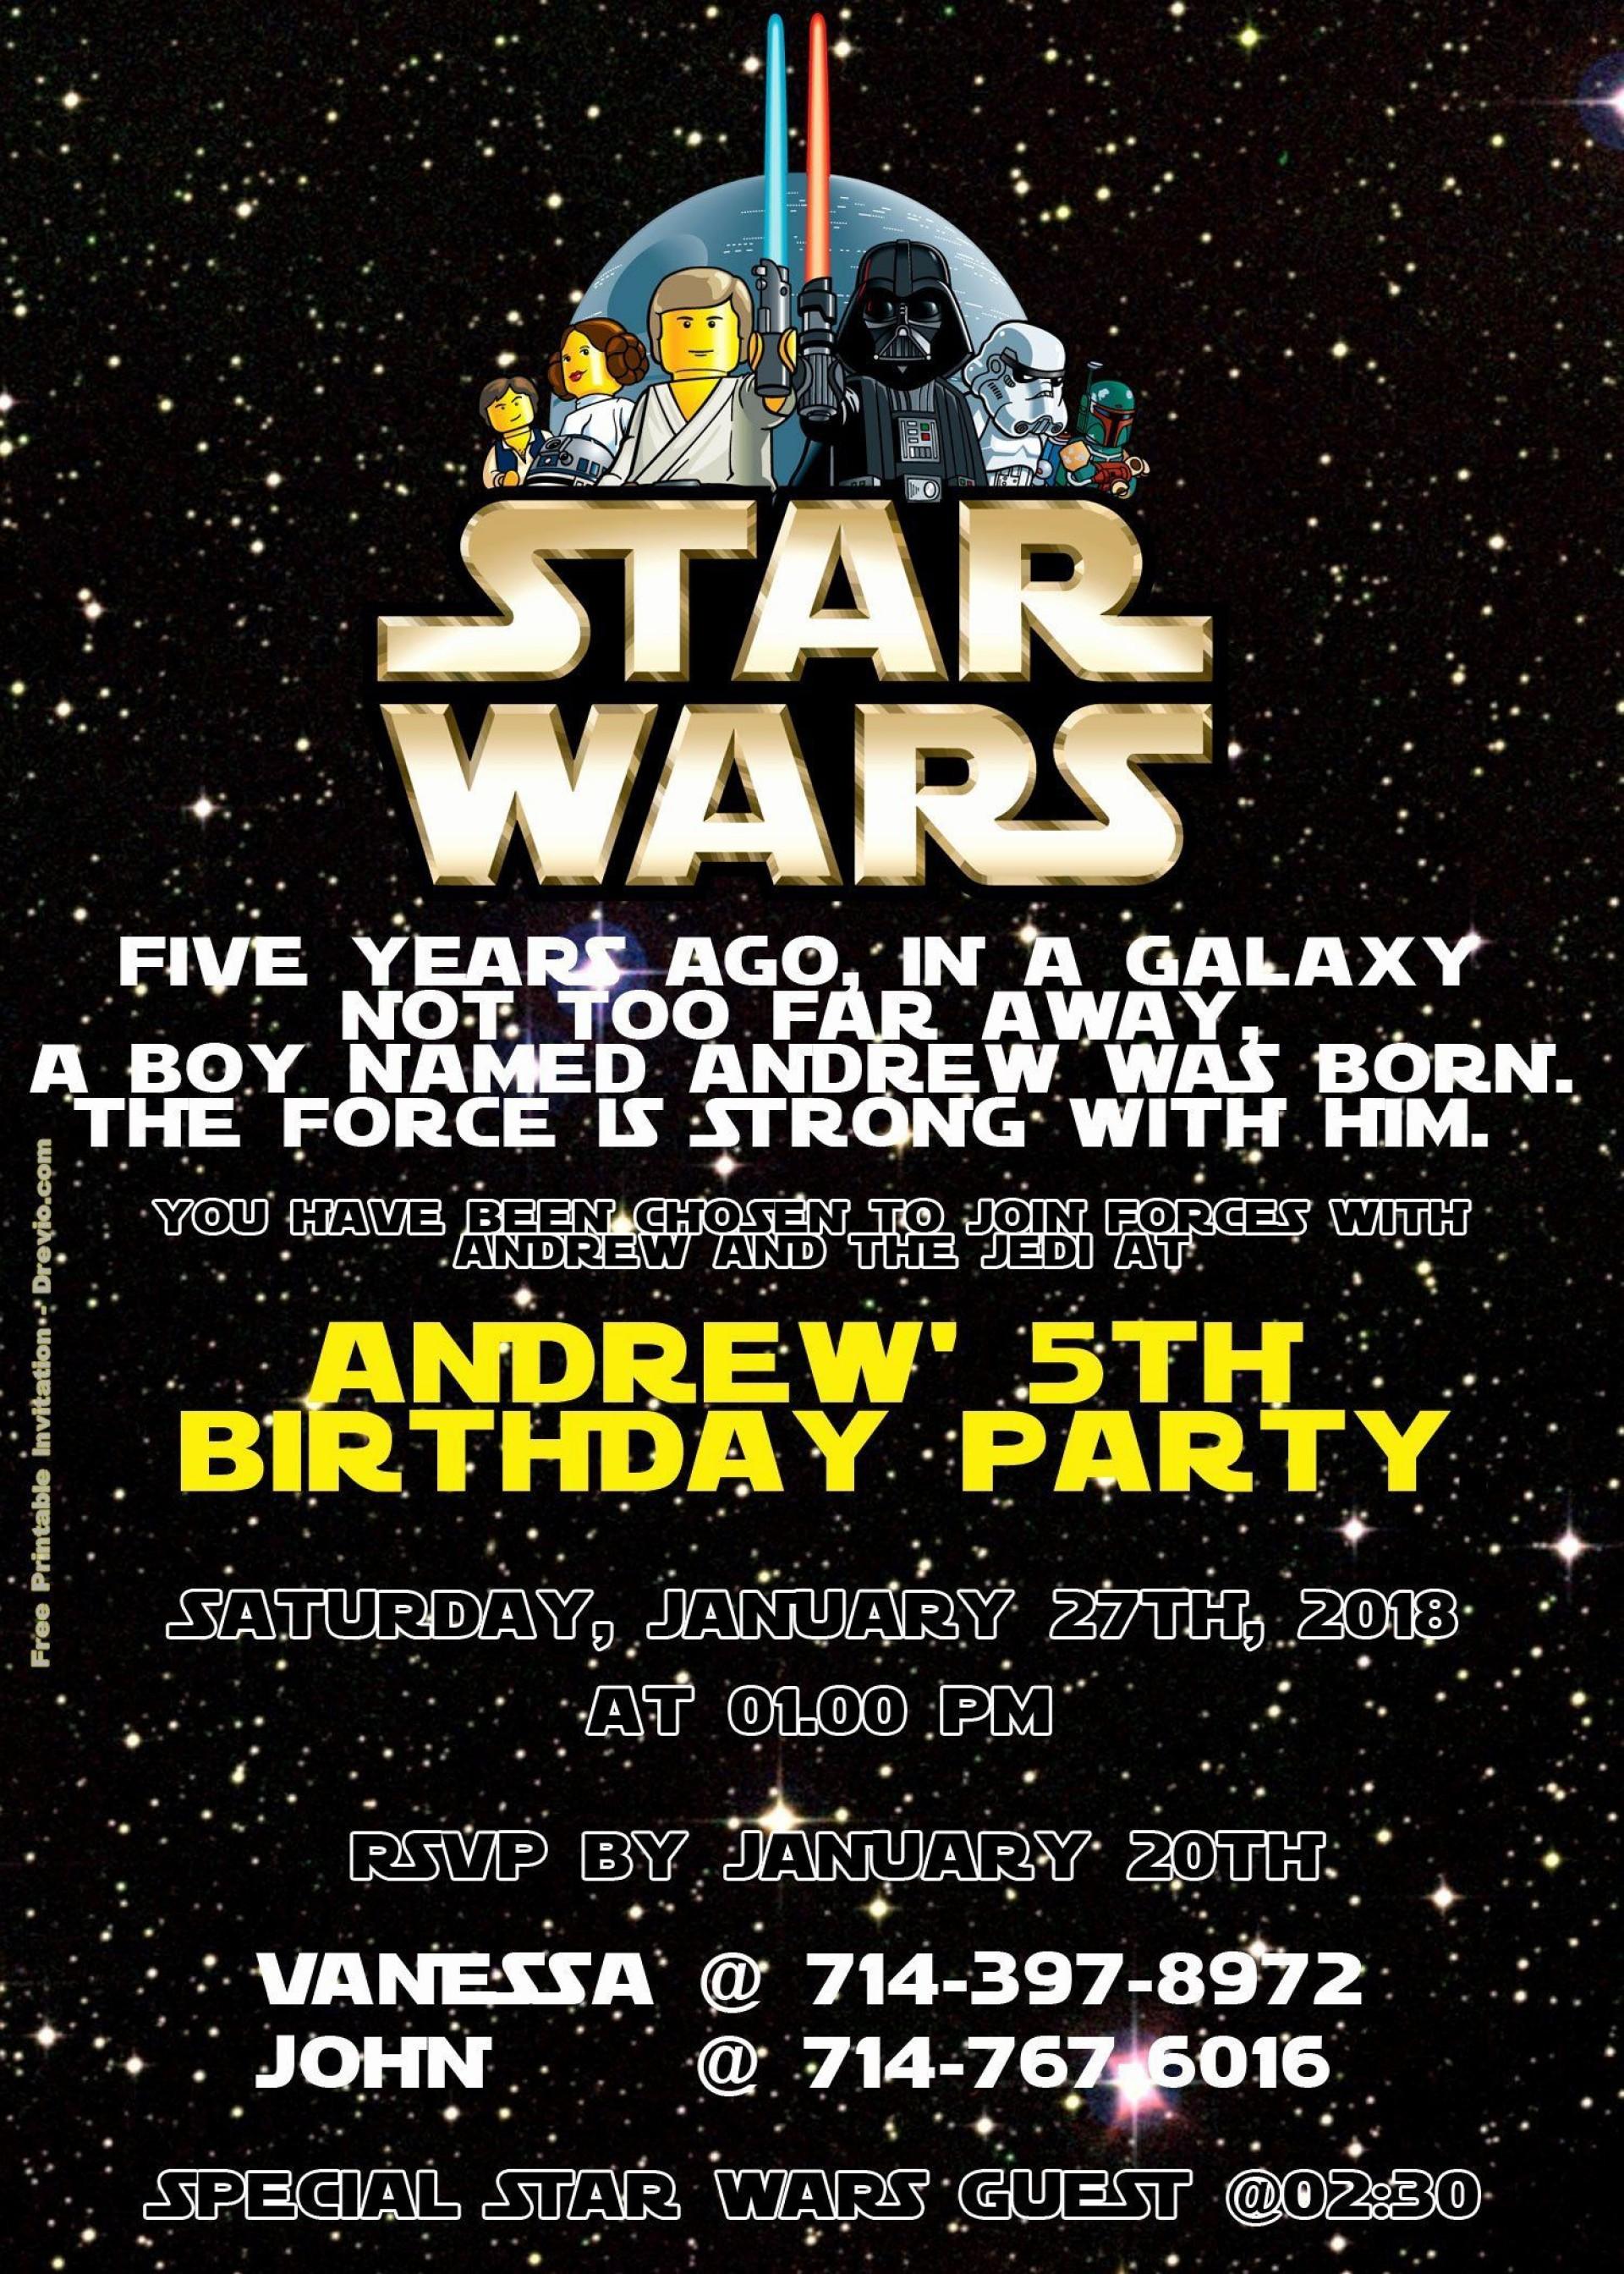 005 Phenomenal Star War Birthday Invitation Template High Def  Free Party Printable1920